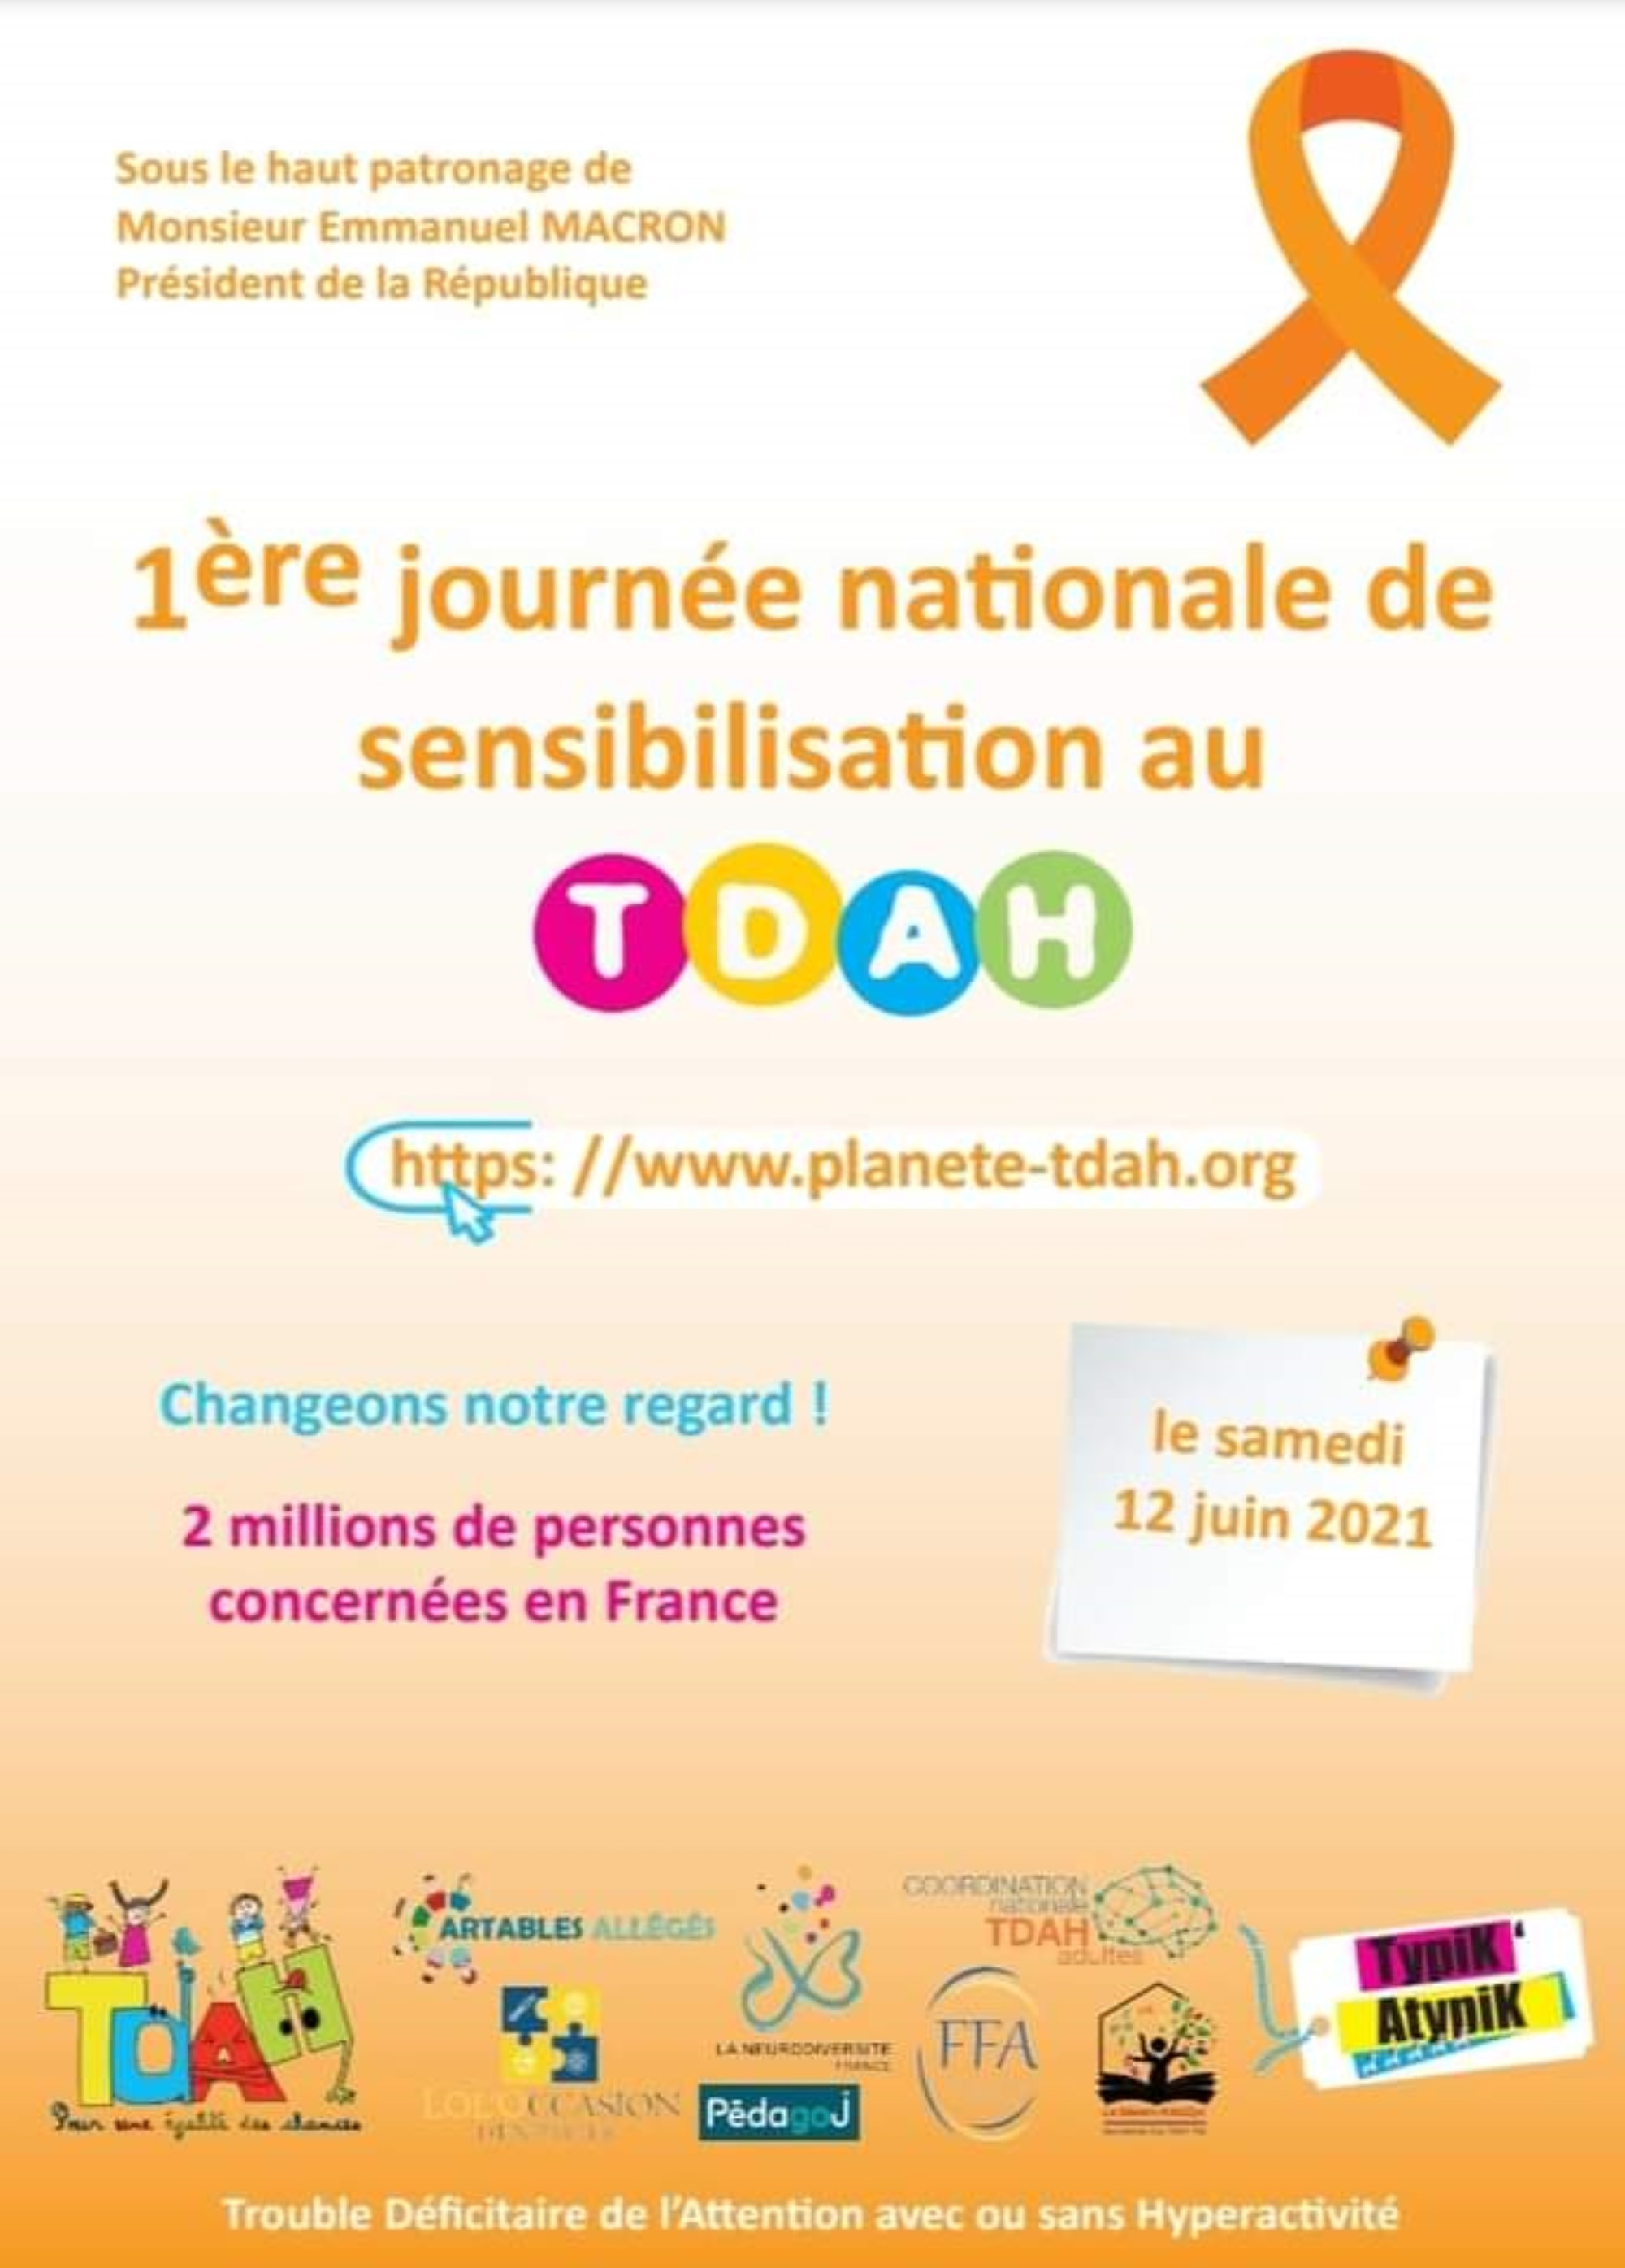 Samedi 12 juin 2021 – Journée nationale de sensibilisation au TDAH